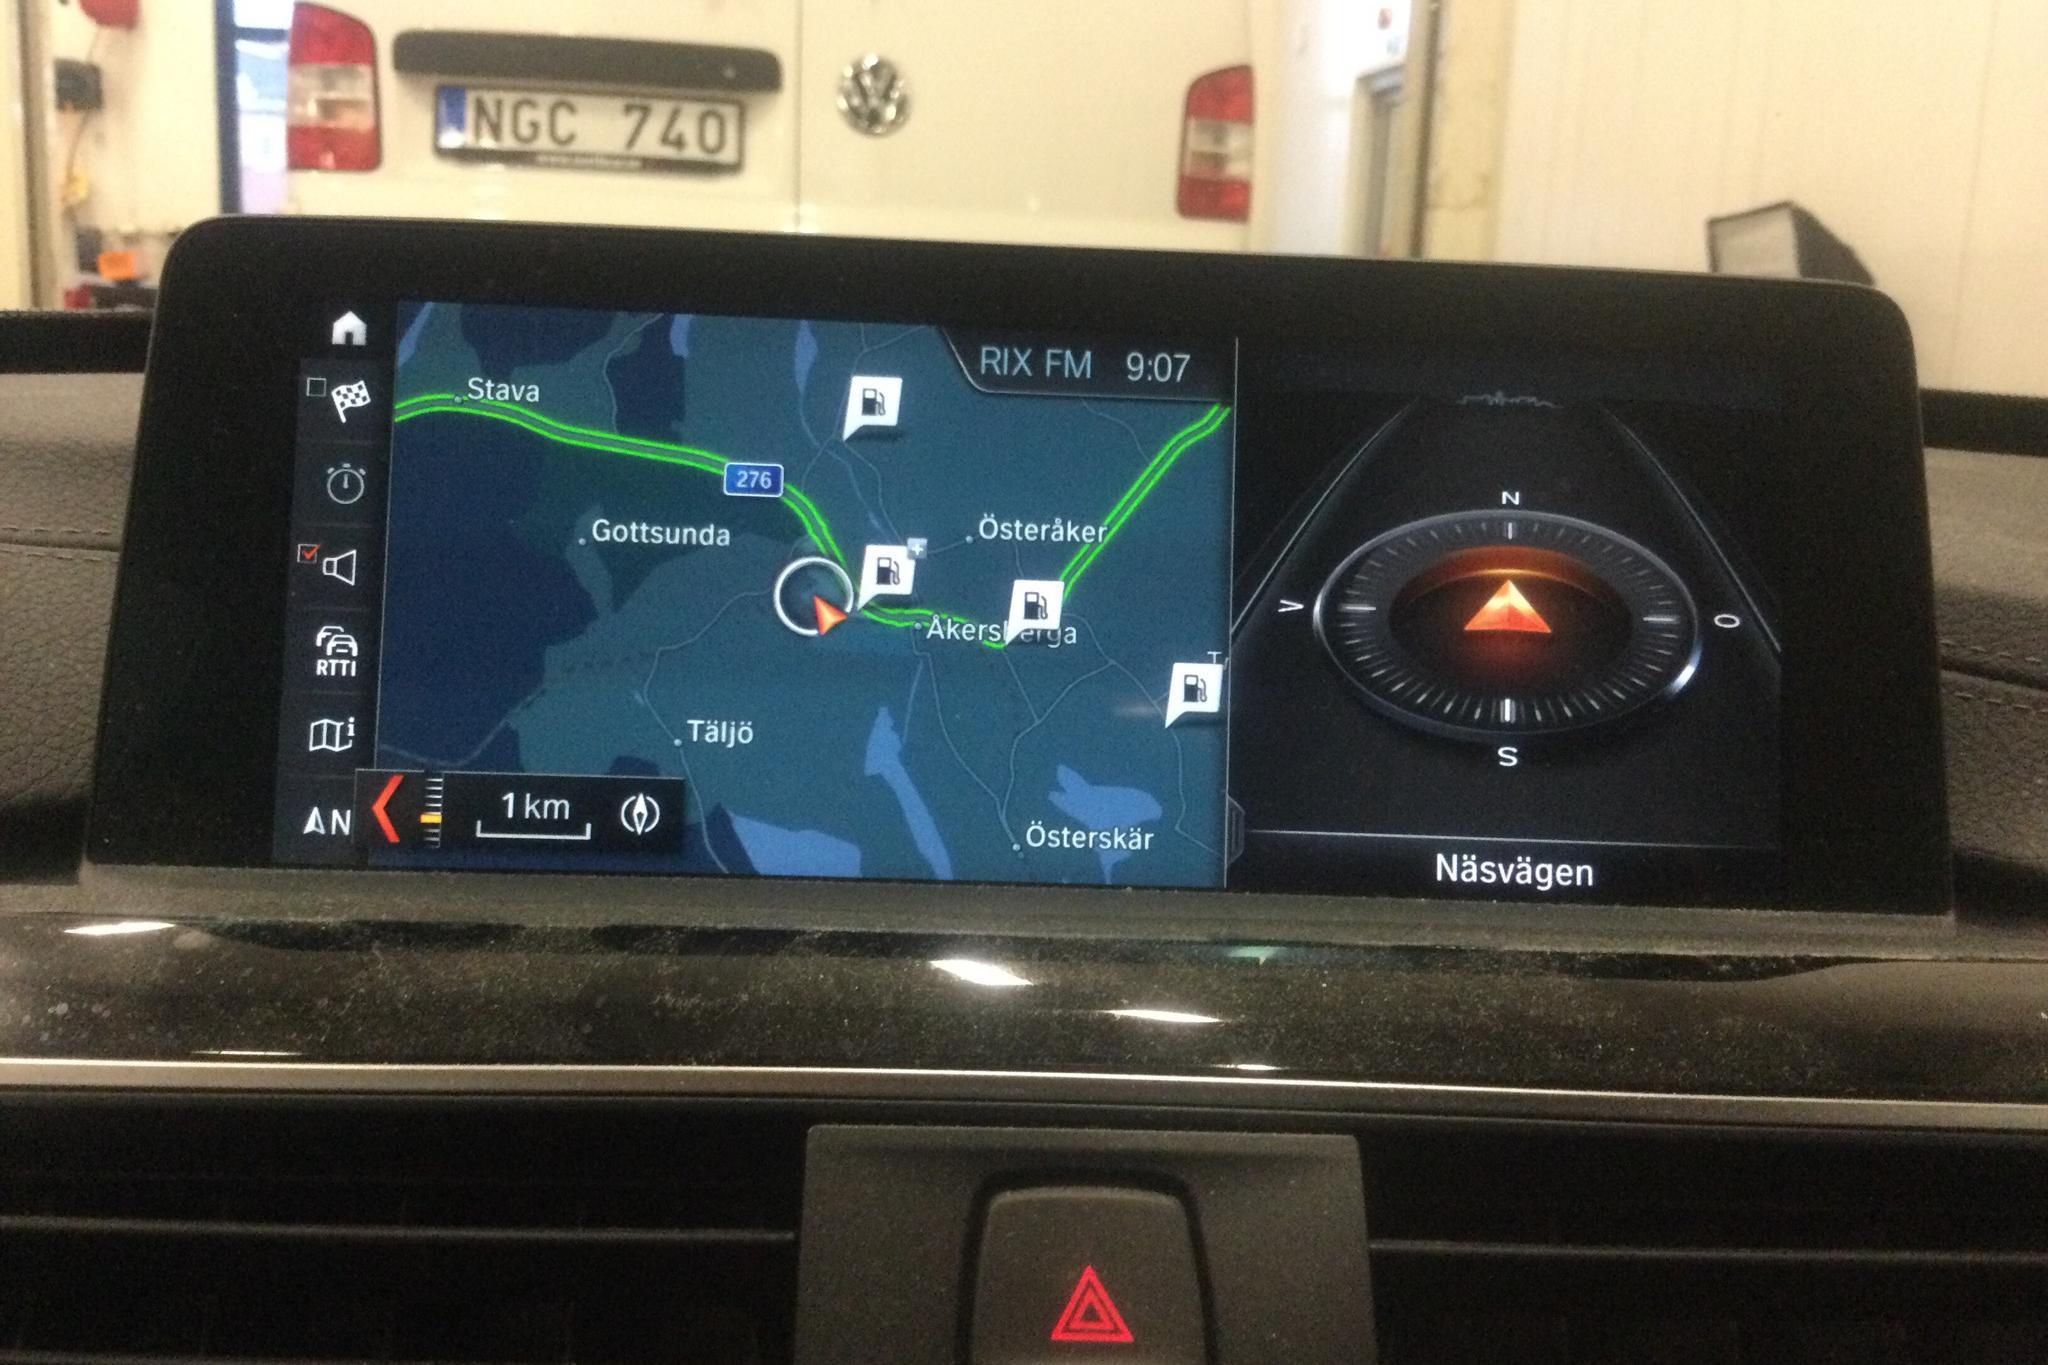 BMW 320d GT xDrive, F34 (190hk) - 35 470 km - Manual - black - 2018